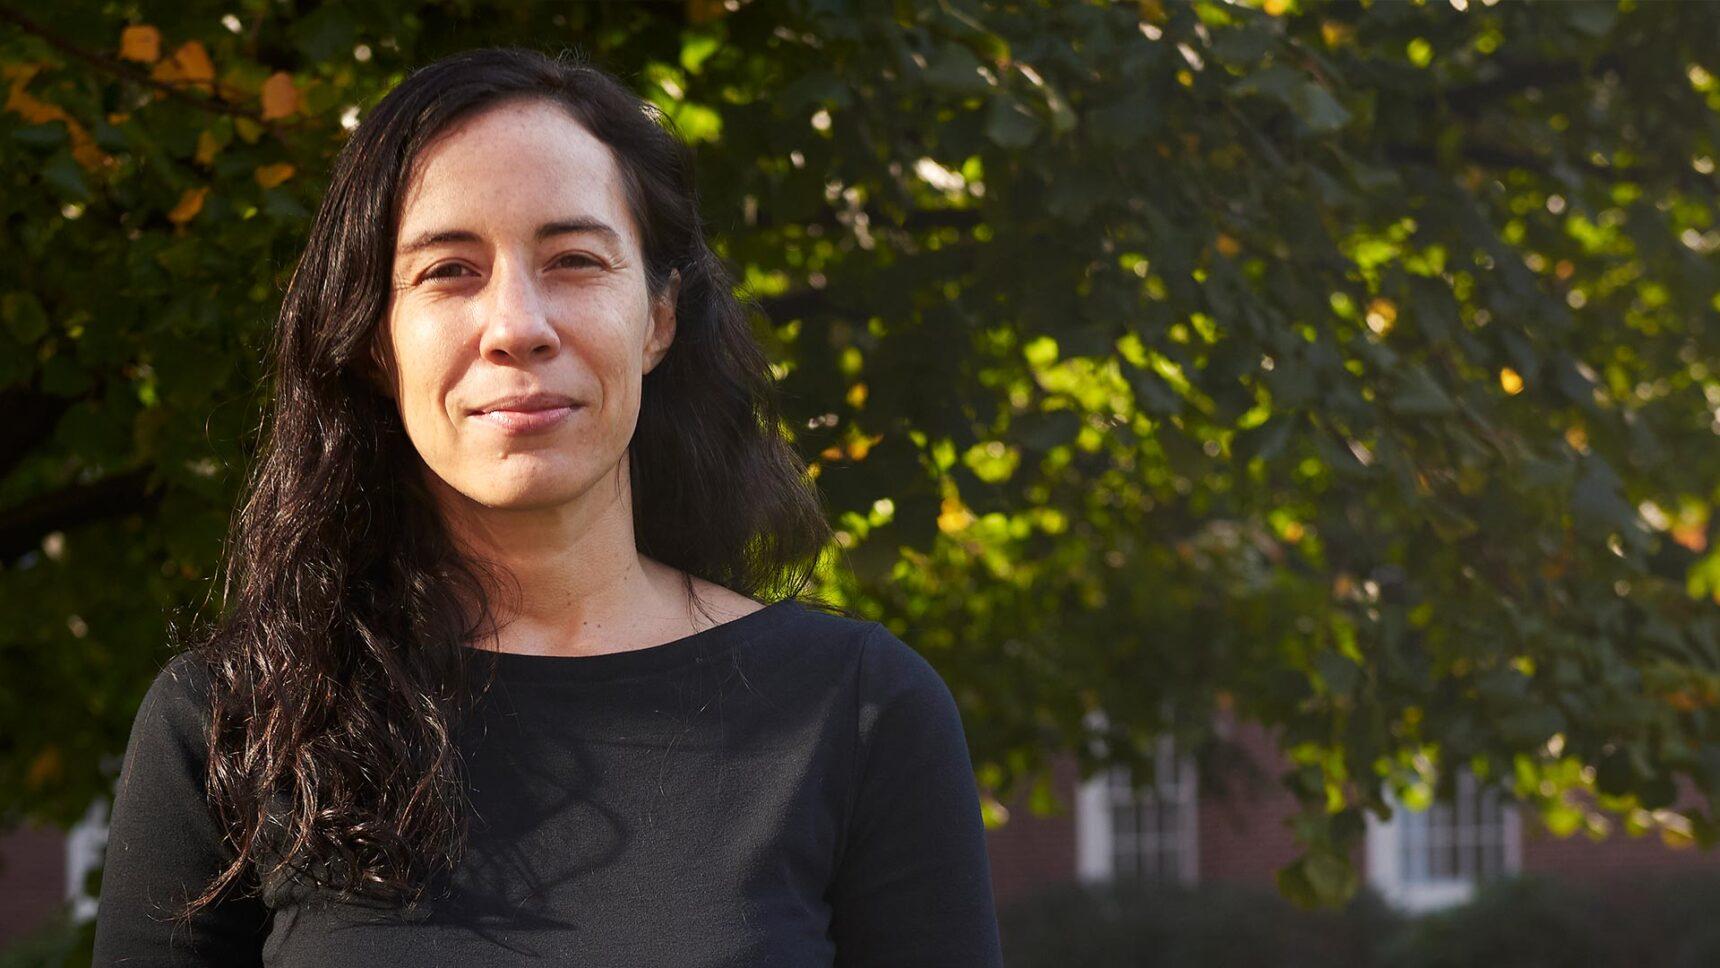 Cora Dvorkin explains her approach to exploring dark matter.